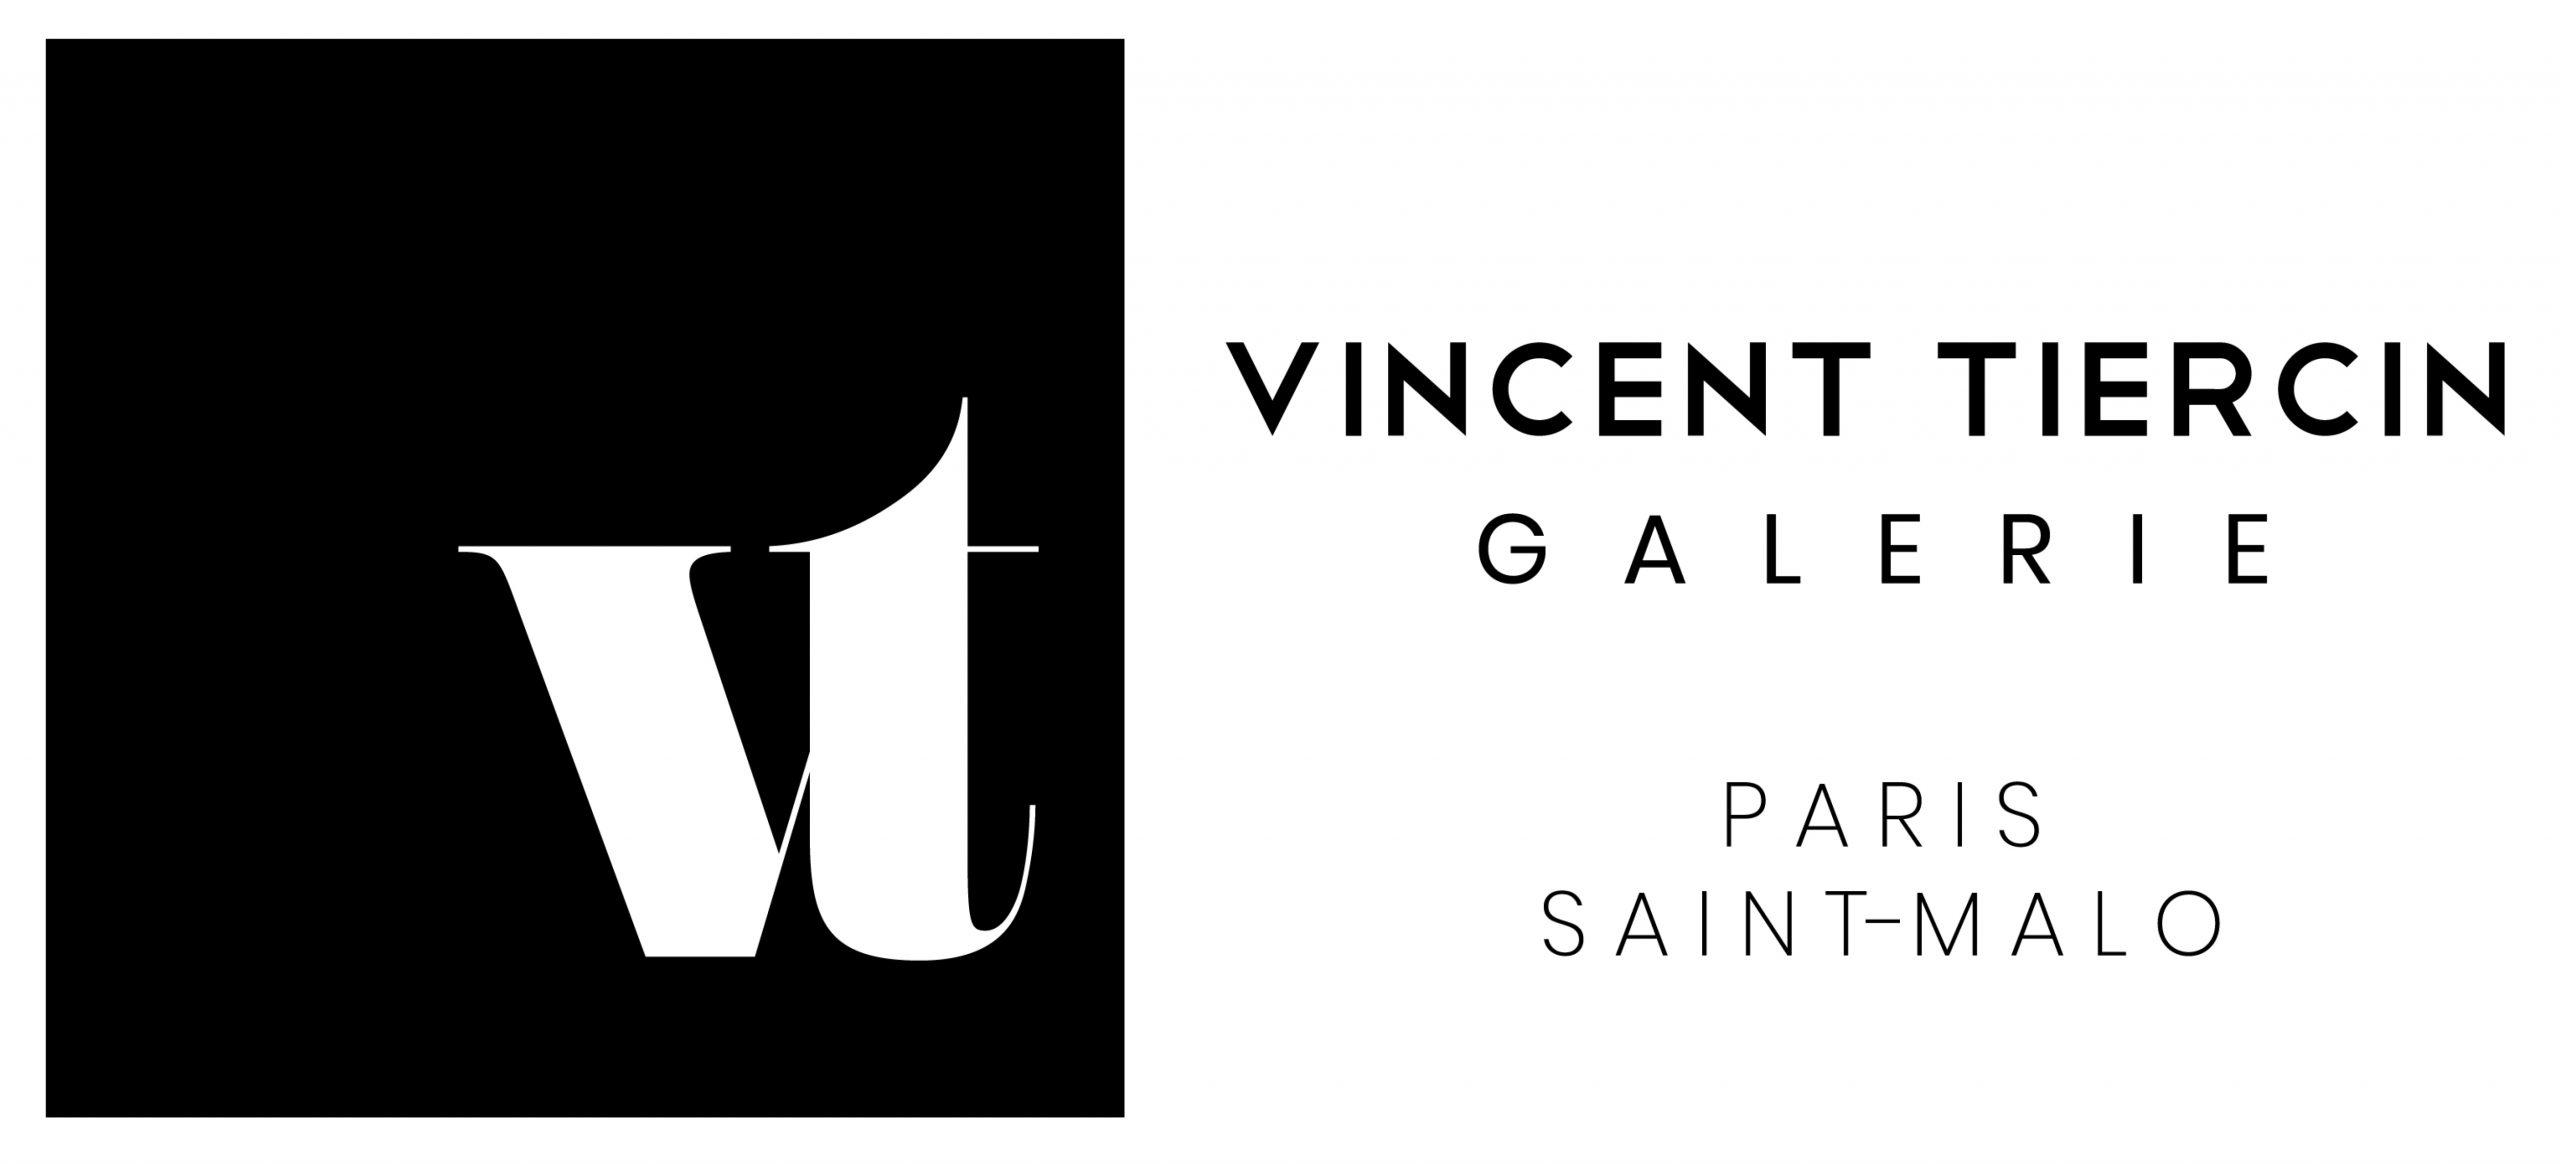 Galerie Vincent Tiercin